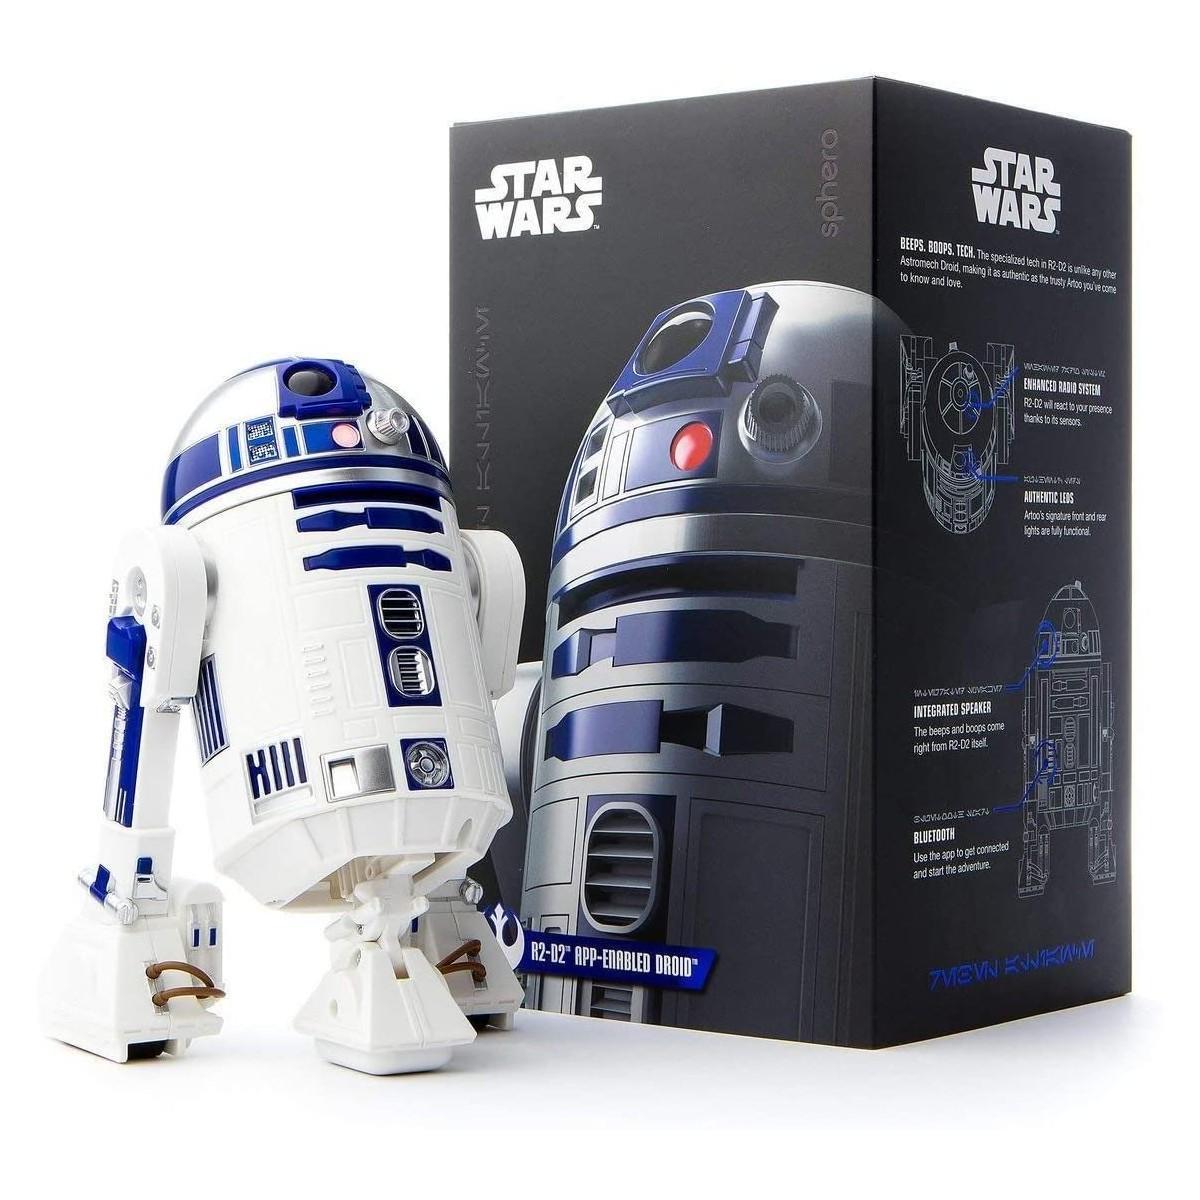 Robot R2D2 Droide Star Wars - Sphero, con APP